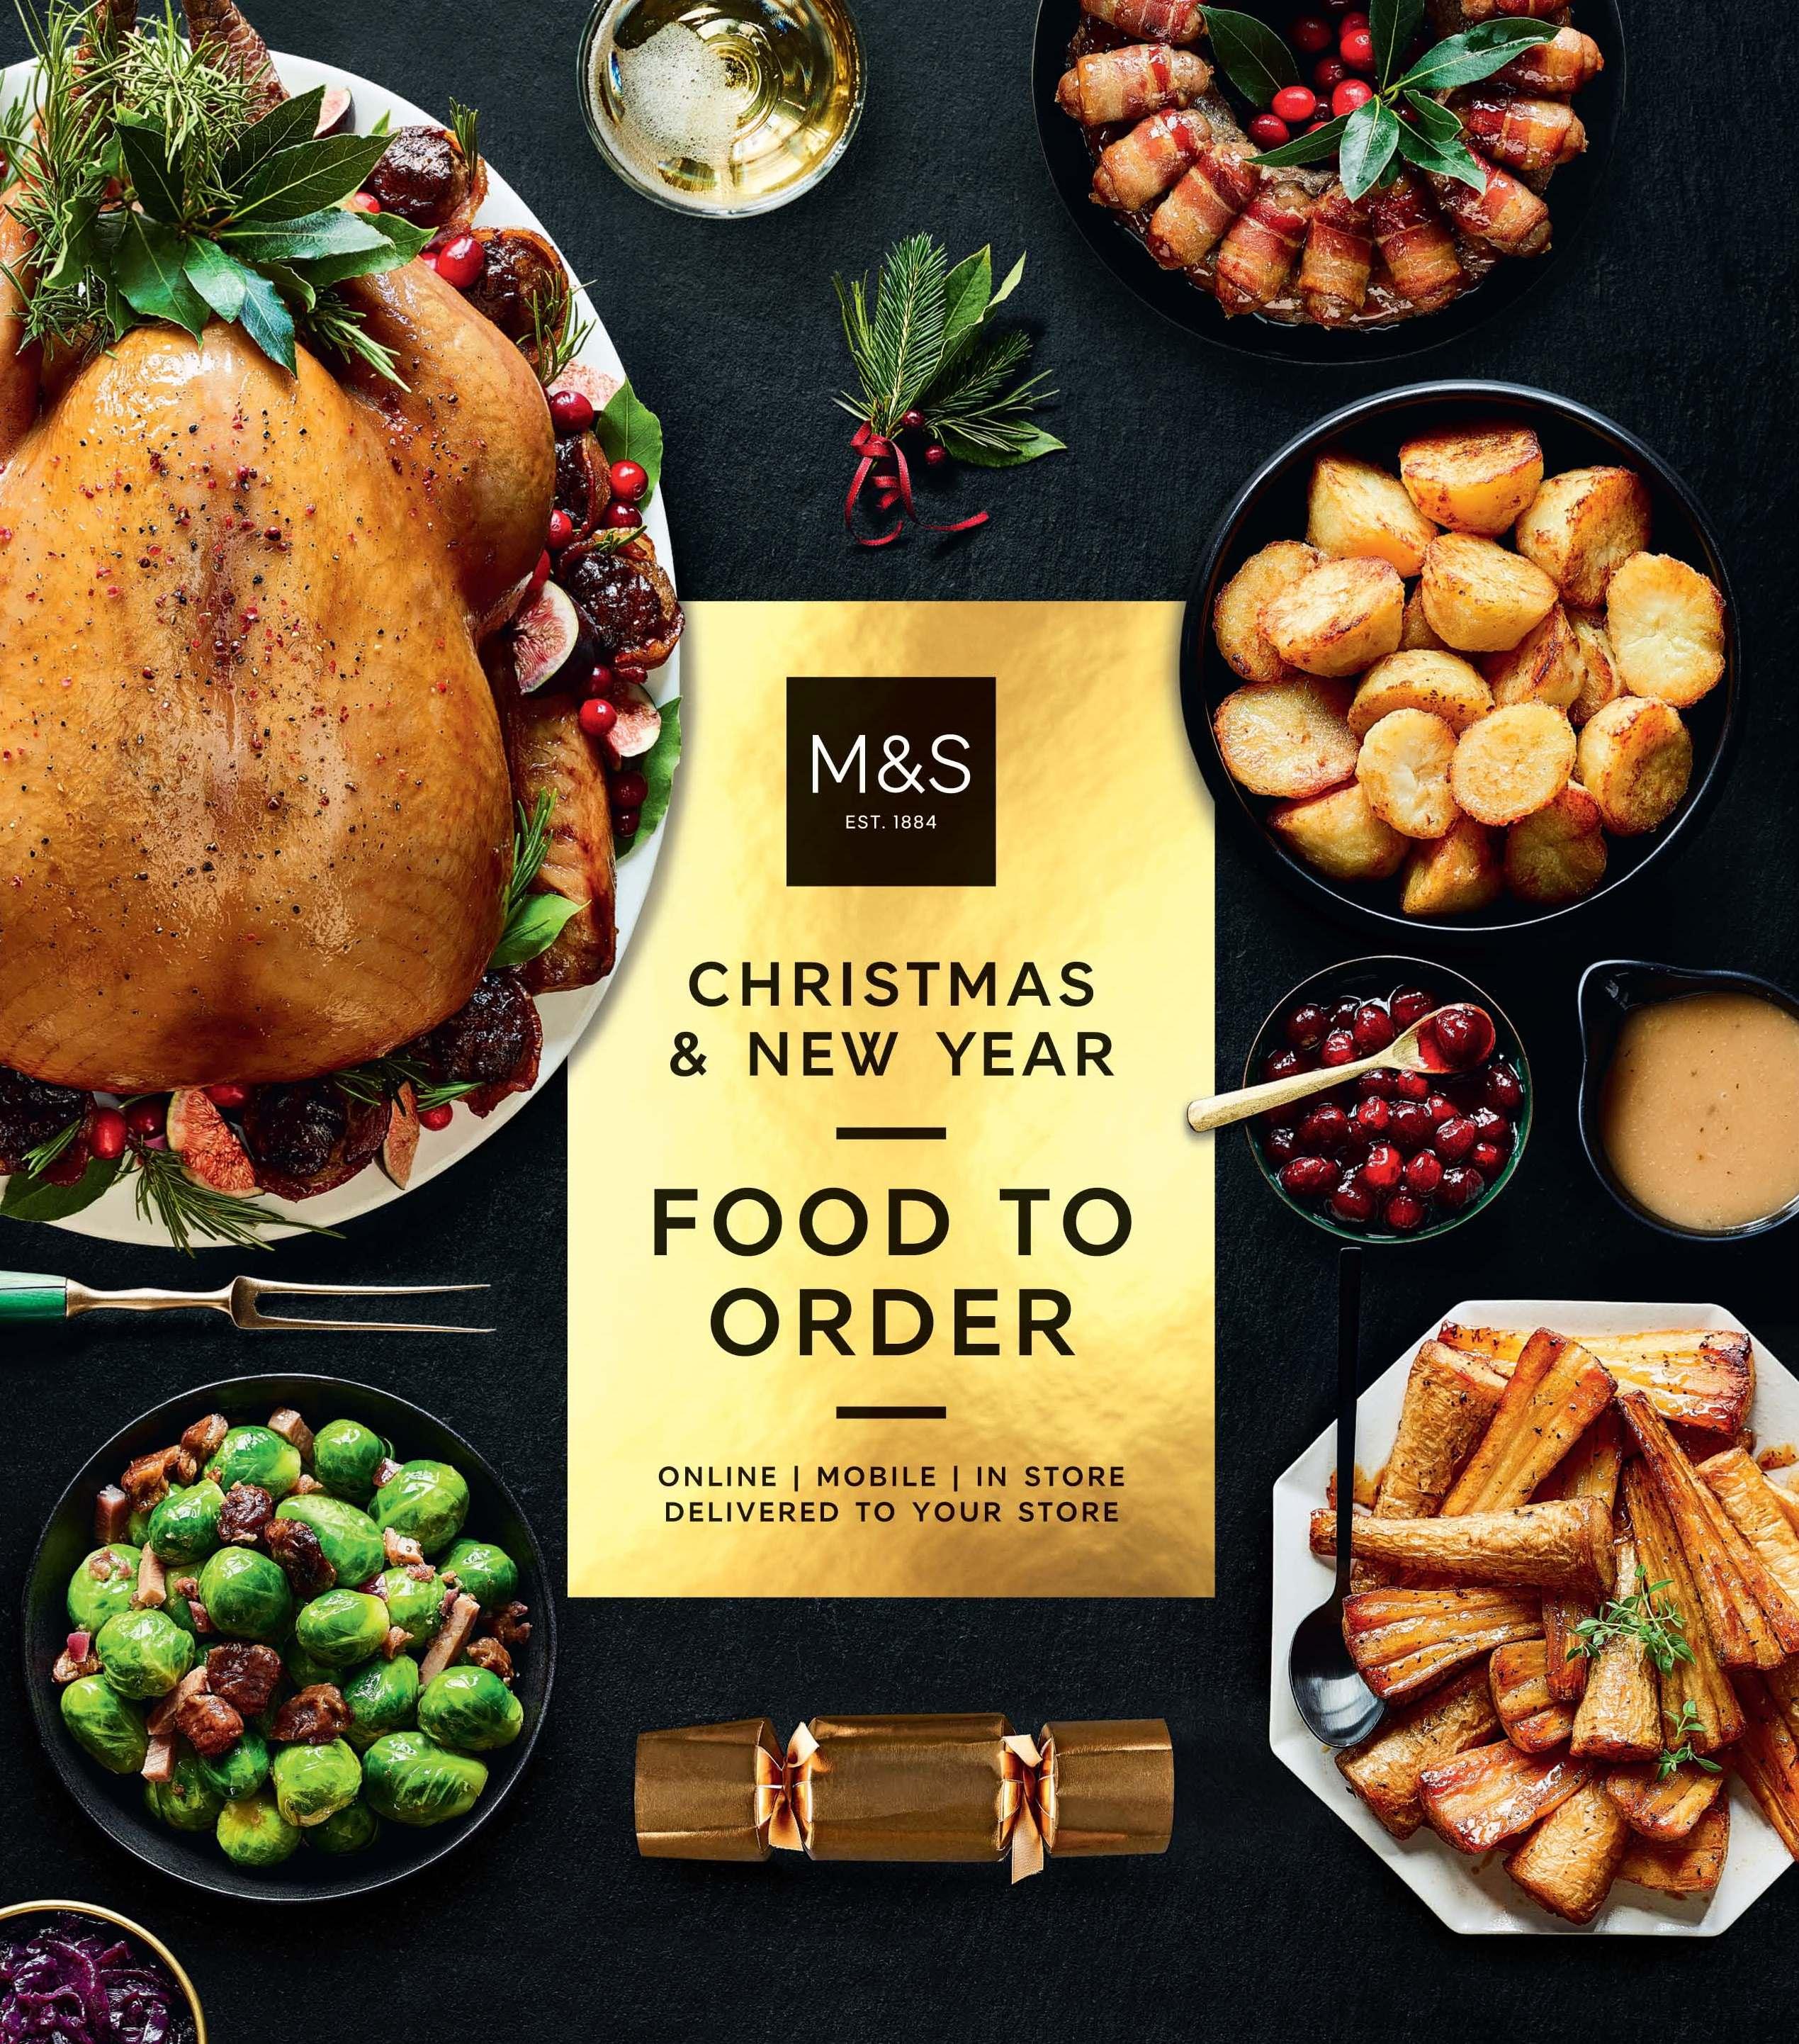 MS_FOOD_XMAS_